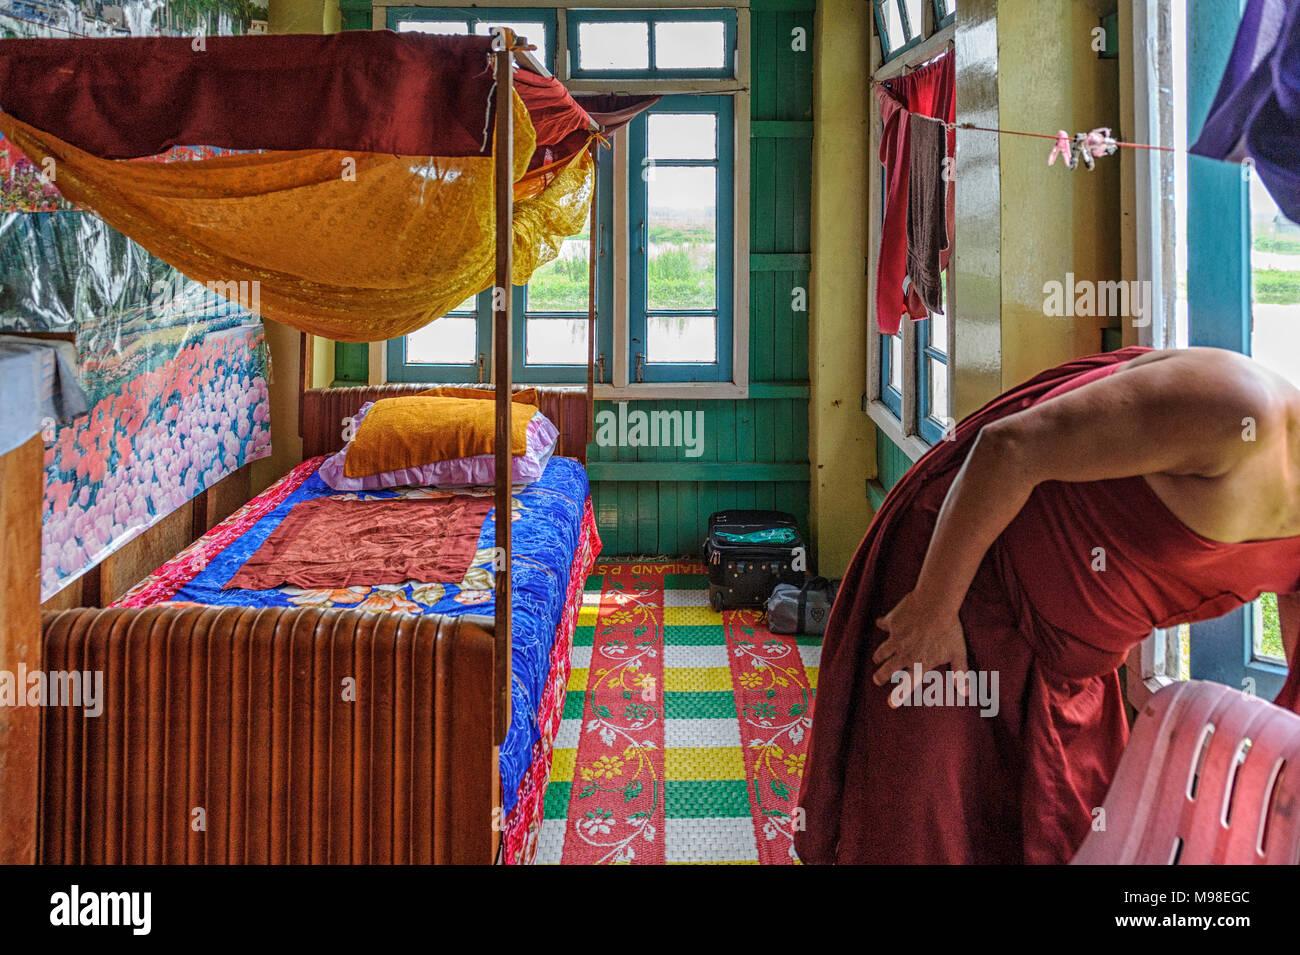 Coin couchage à l'chat saut (Monastère Nga Hpe Chaung) Myanmar Photo Stock